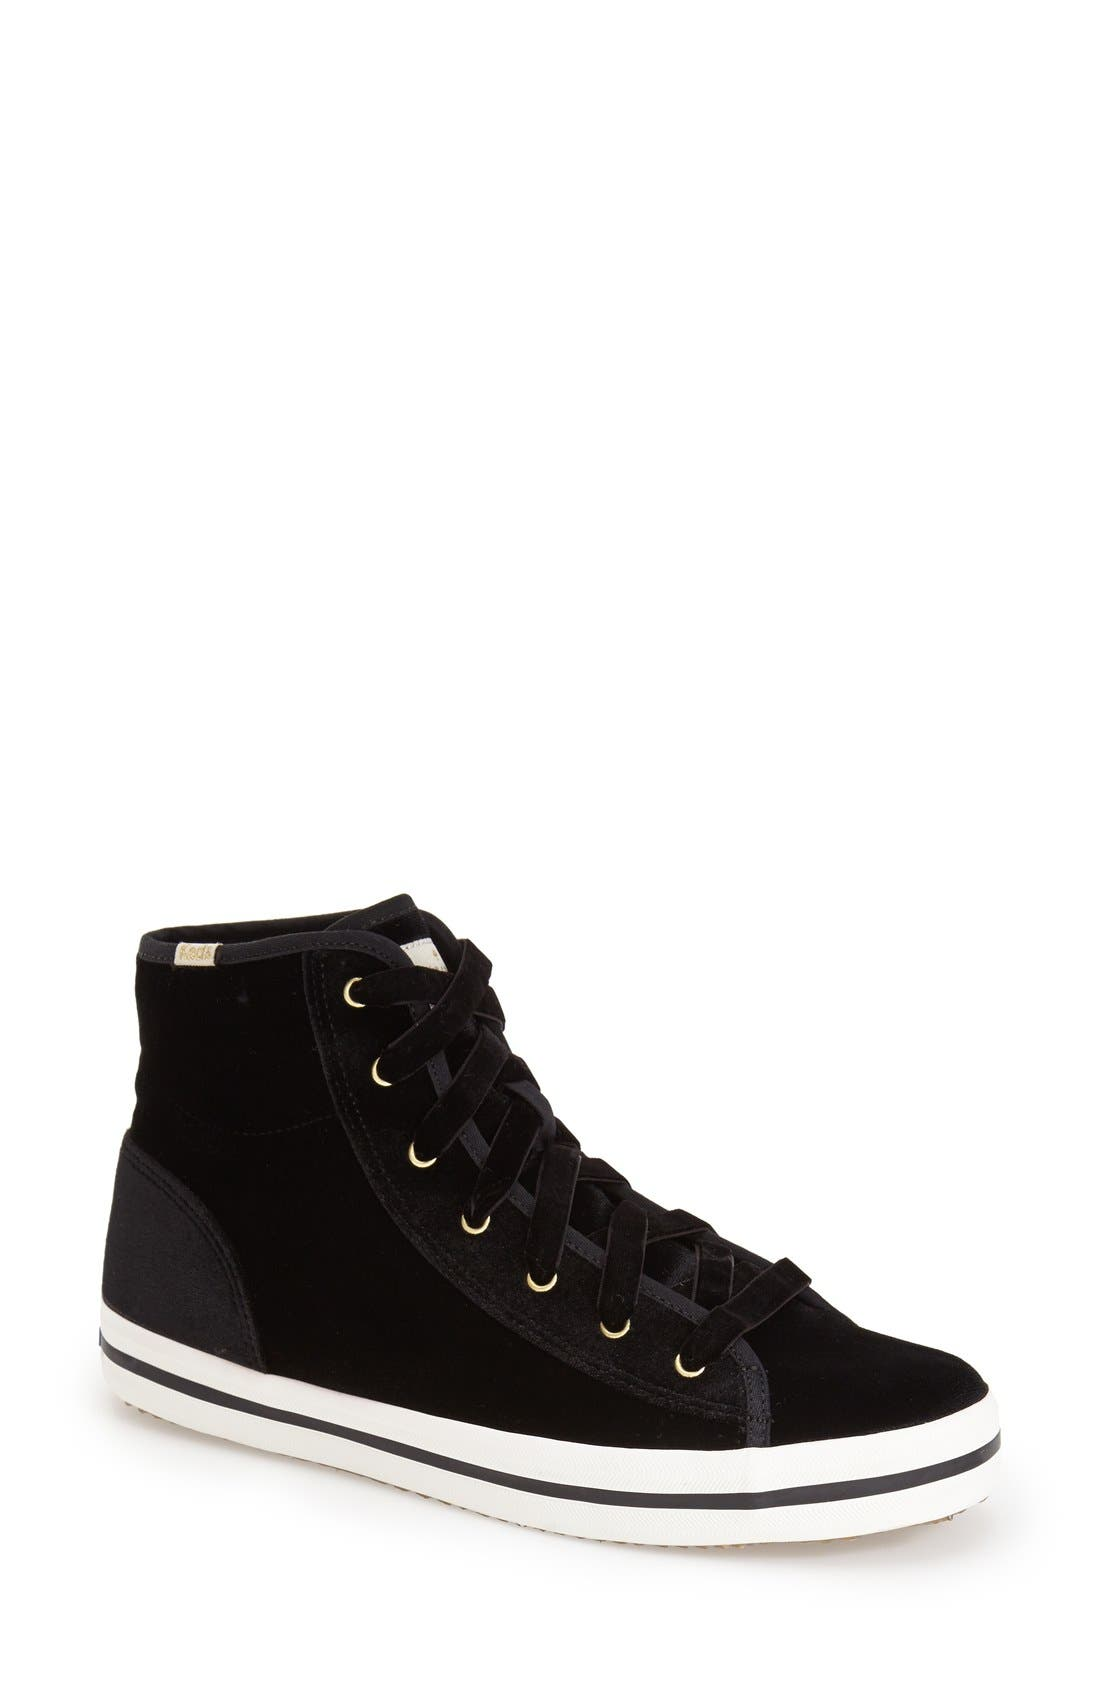 Main Image - Keds® for kate spade new york 'dori' high top sneaker (Women)